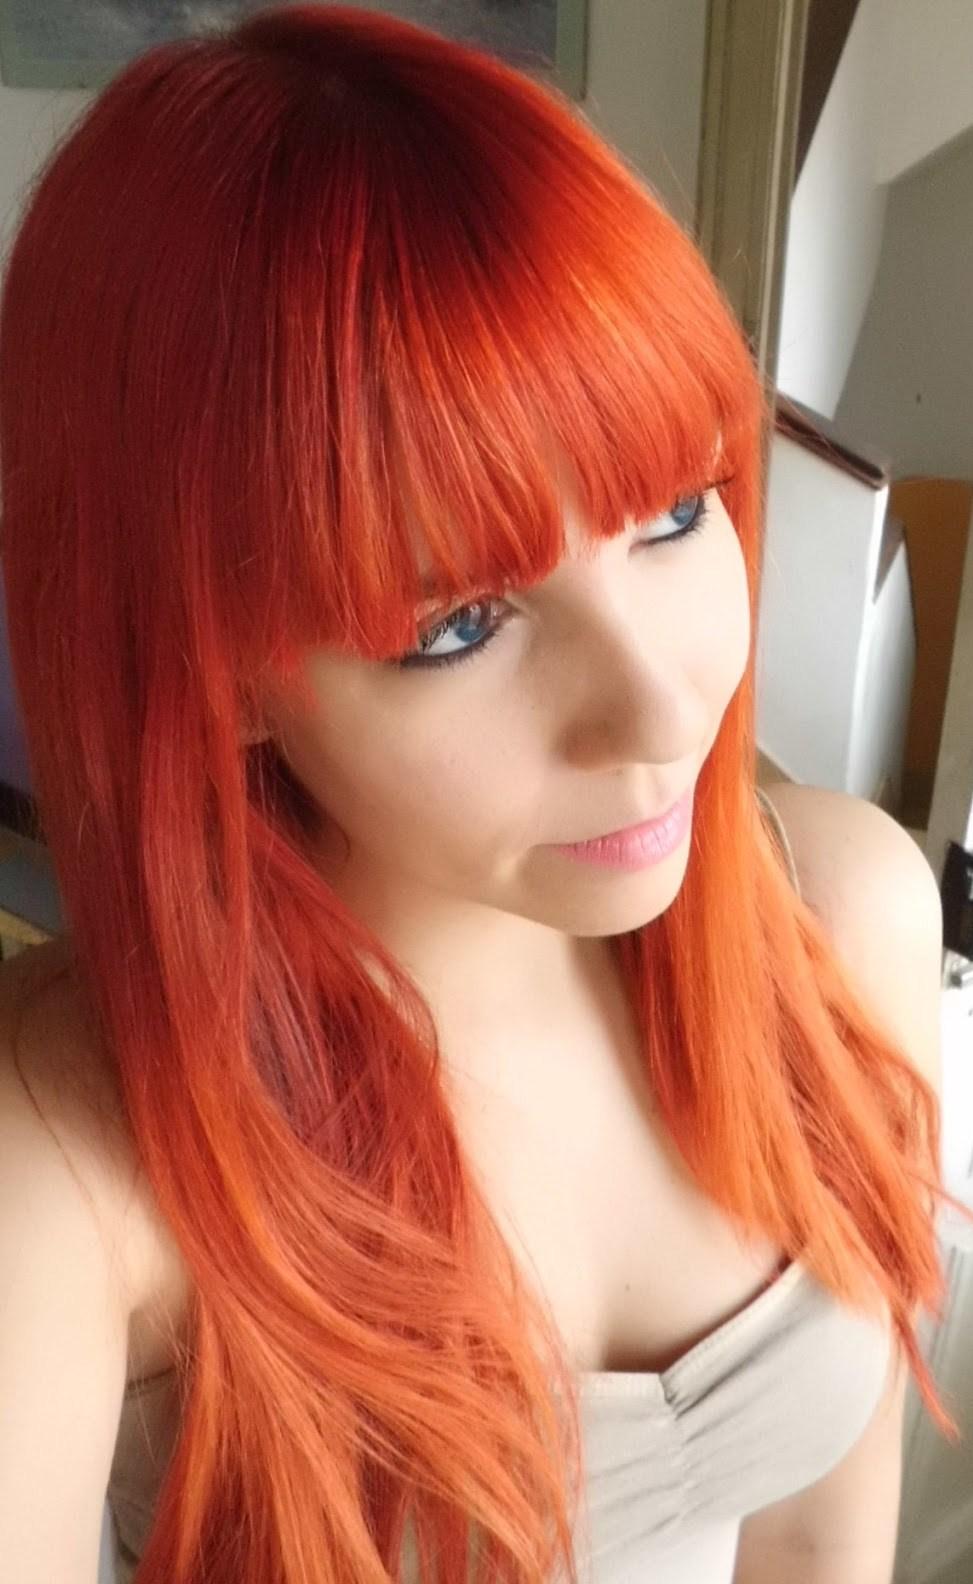 http://3.bp.blogspot.com/-tZhnVKIAEEM/UQ51Jdatt4I/AAAAAAAAP7I/PKLvfBY2EJ0/s1600/Pelo+degradado+pelirroja+redhead+ginger+girl+(2).JPG